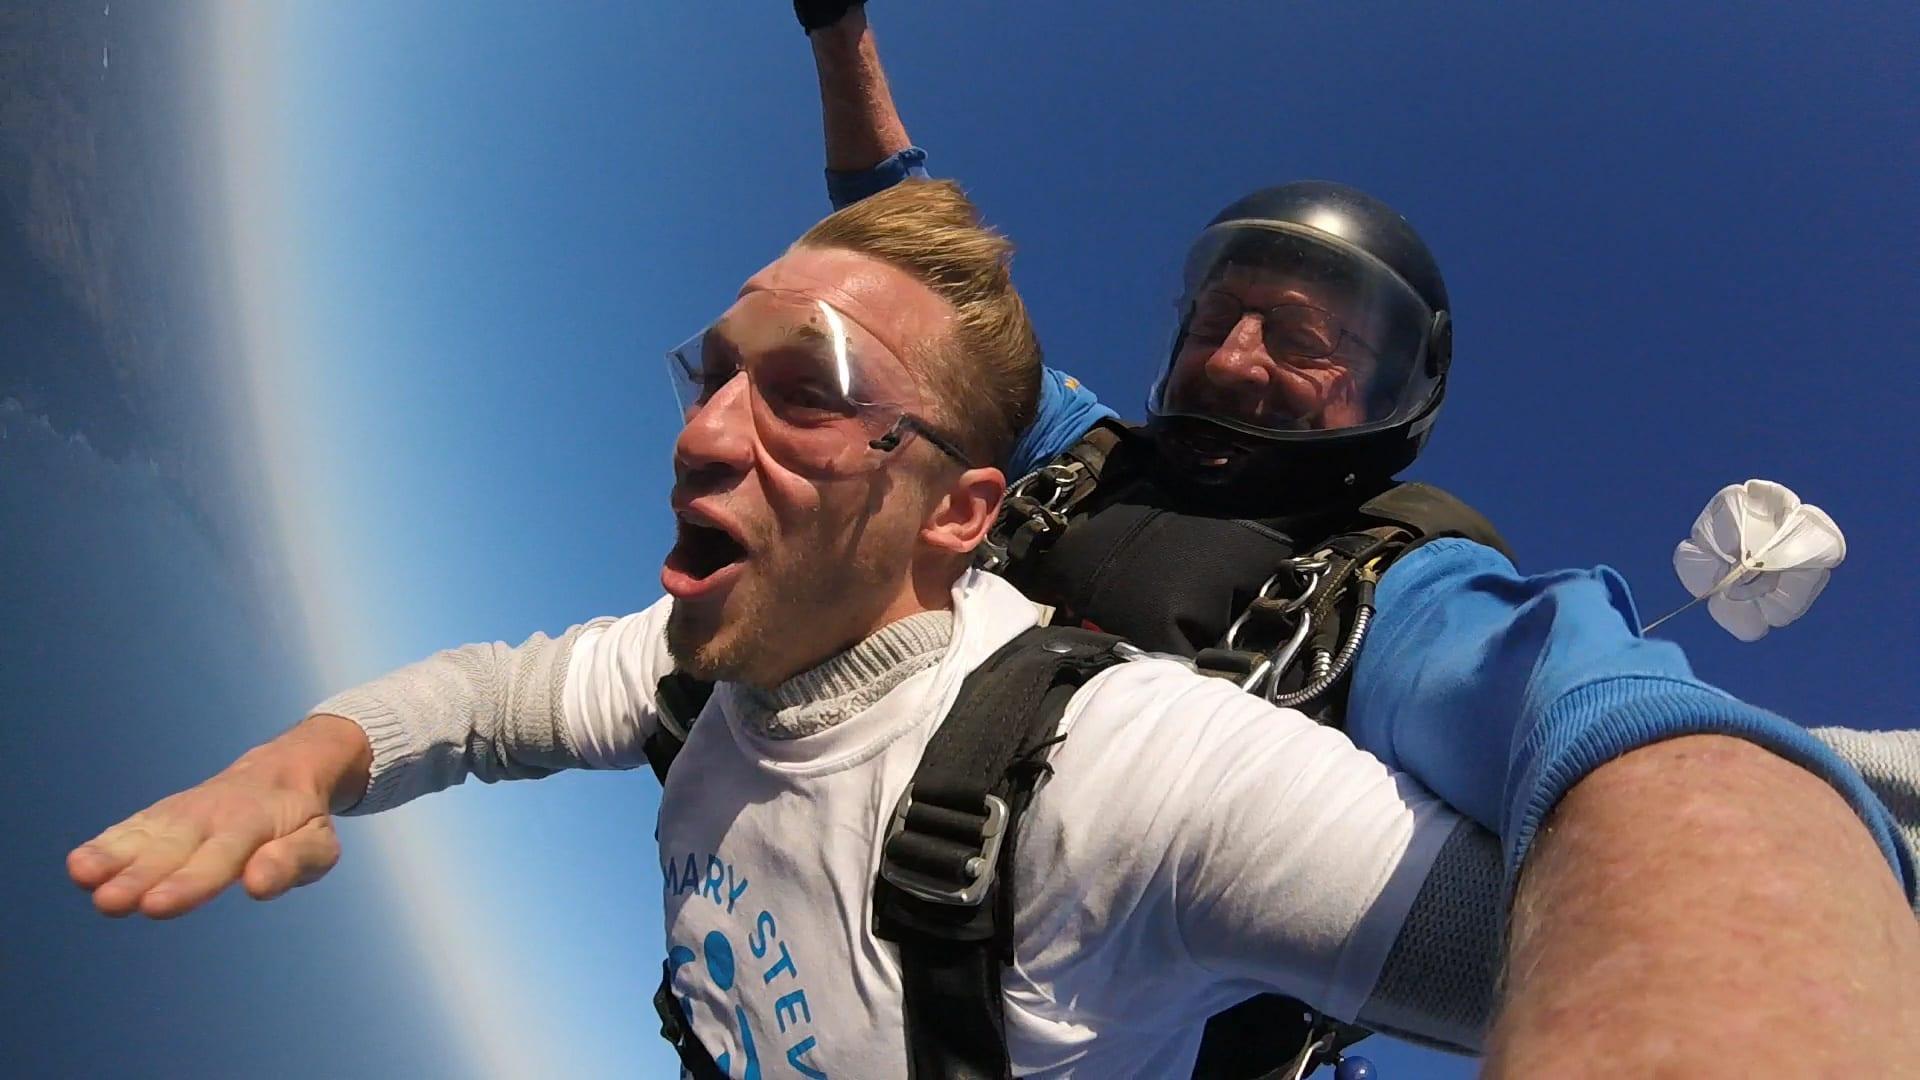 Skydive 2018